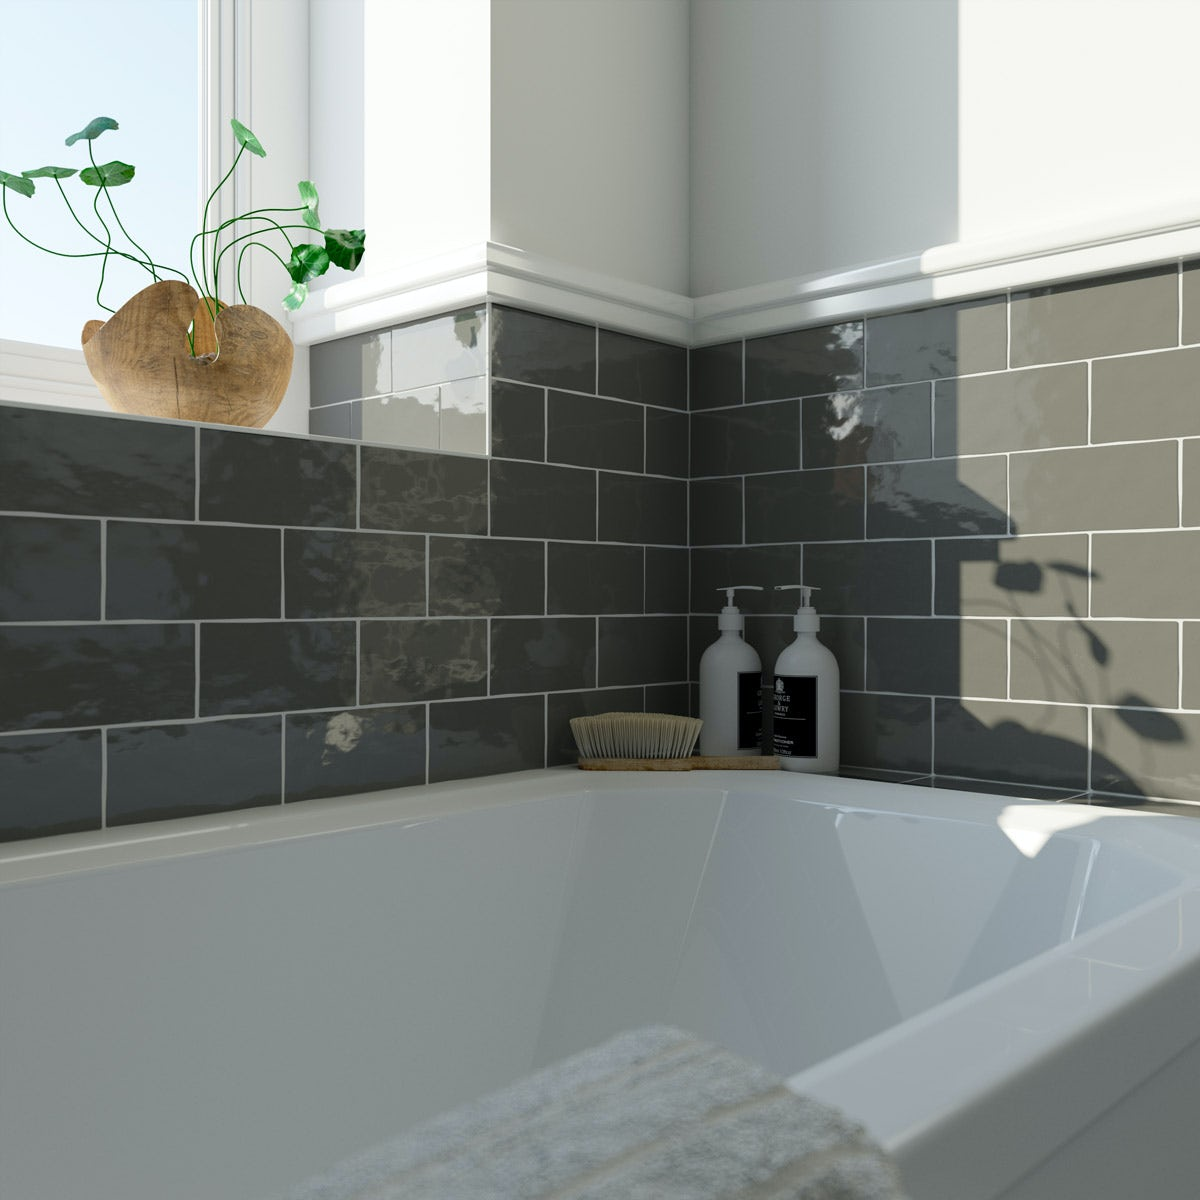 Laura Ashley Artisan Charcoal Grey Gloss Wall Tile 75mm X 150mm